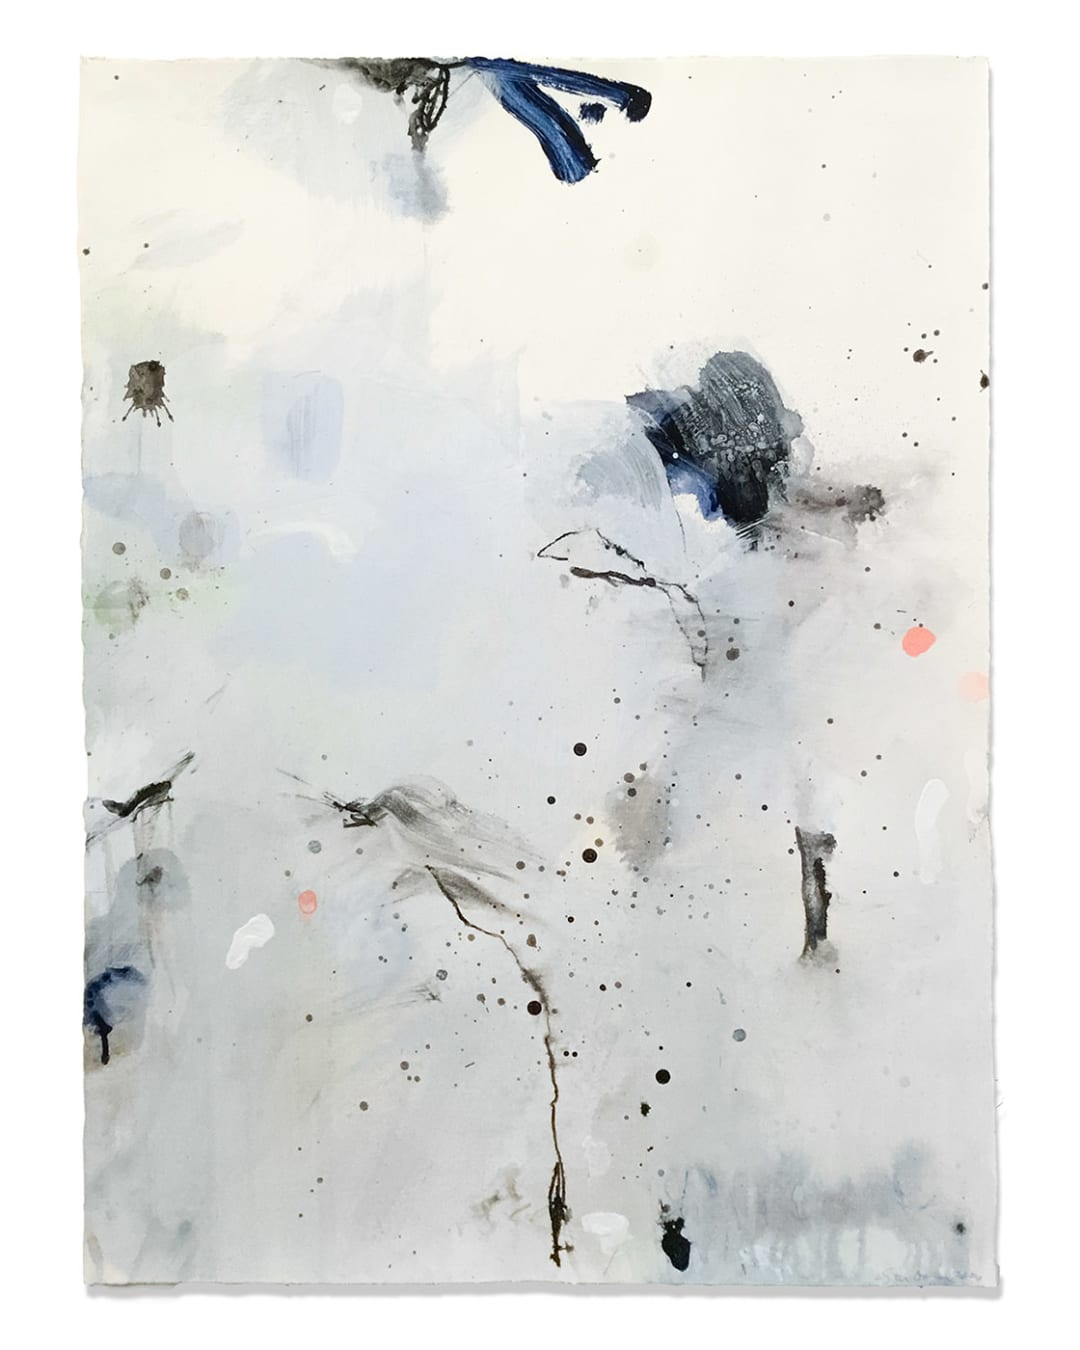 Stu Oxley- Drawings 17, 2020